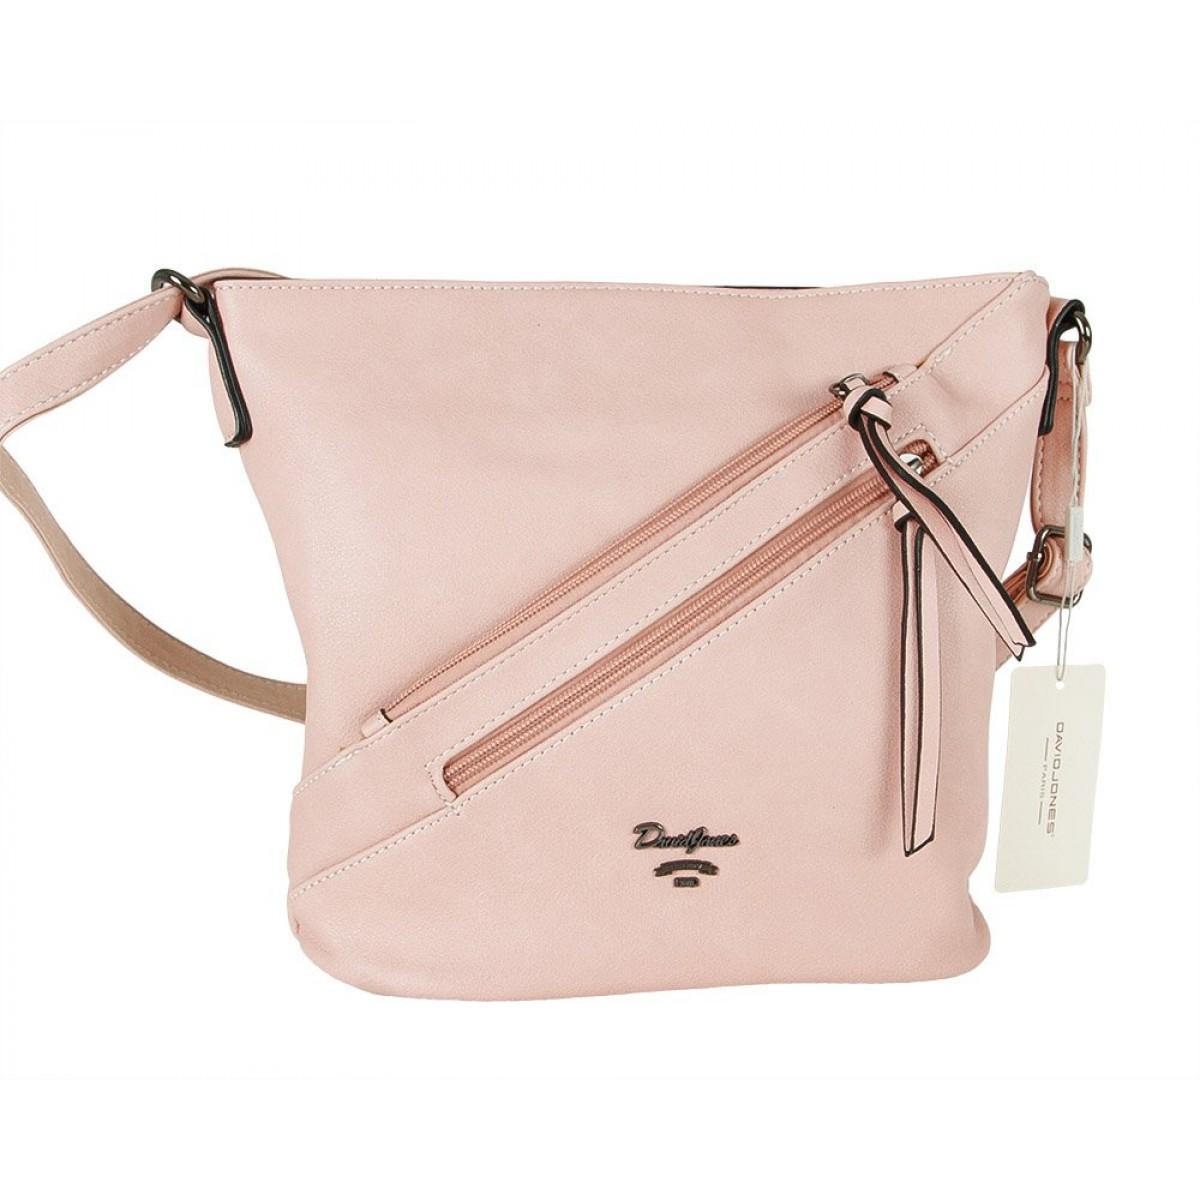 Жіноча сумка David Jones 6202-2A PINK